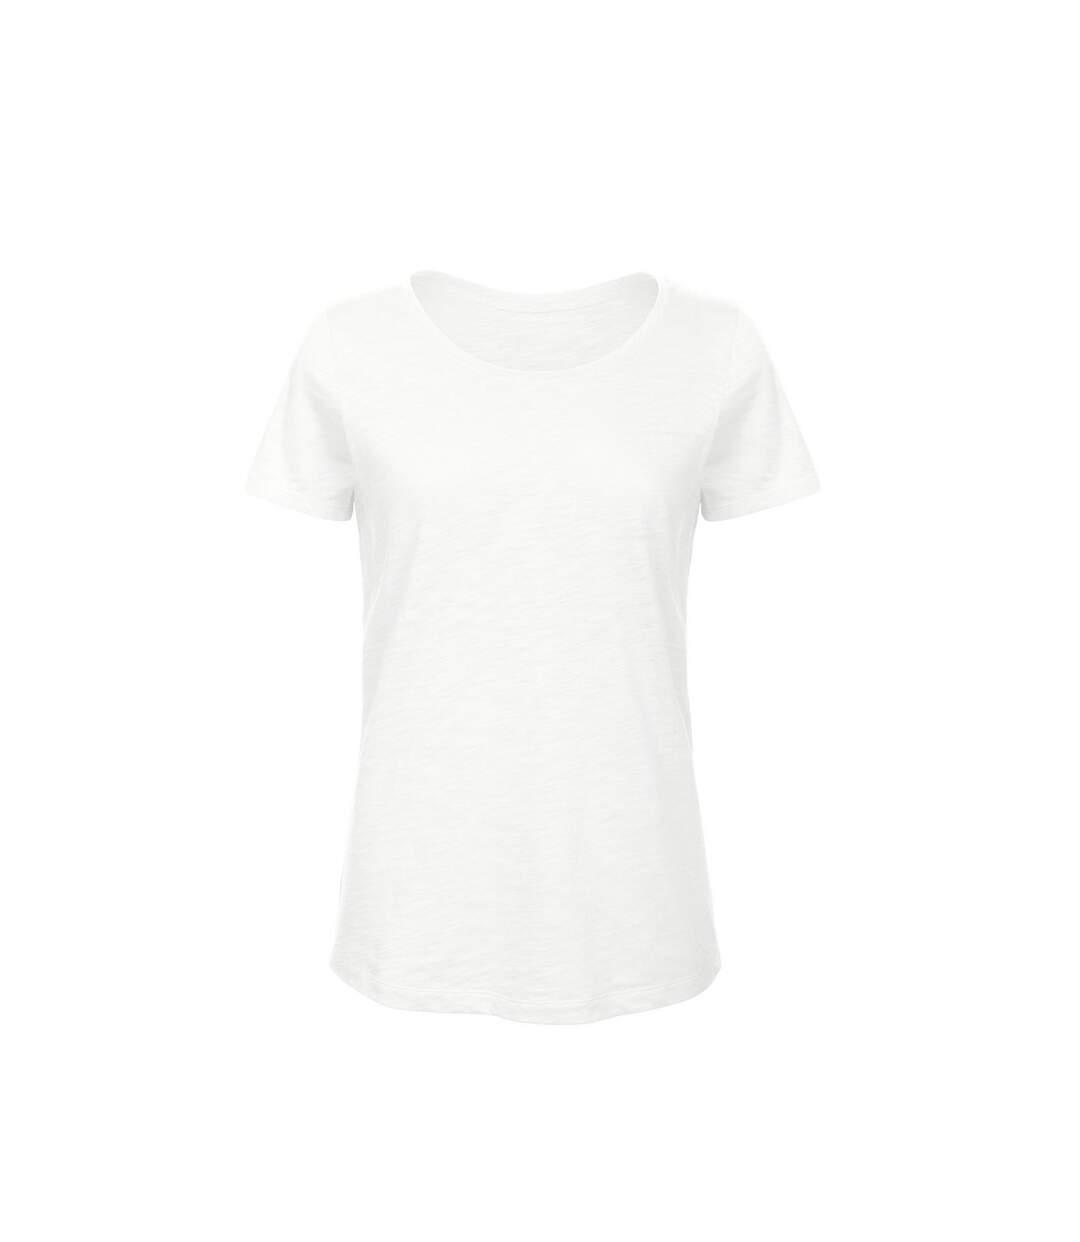 B&C Favourite - T-Shirt En Coton Bio - Femme (Blanc) - UTBC3643